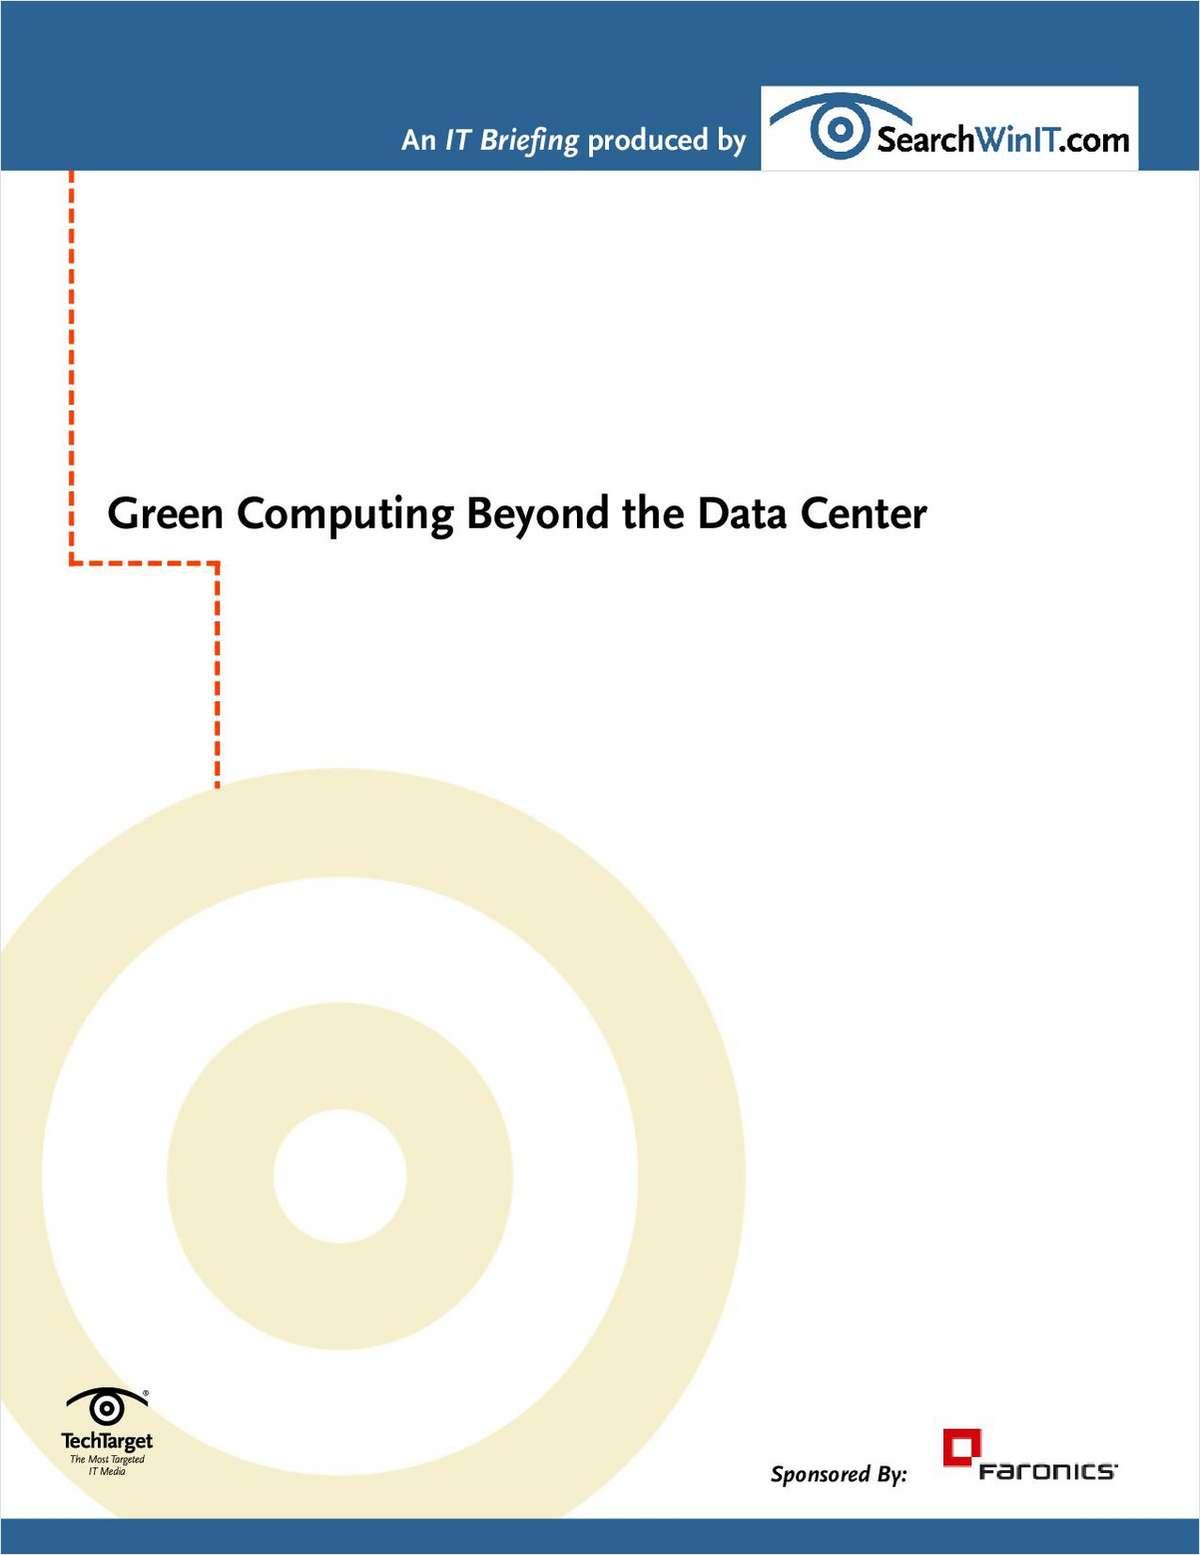 Green Computing Beyond The Datacenter